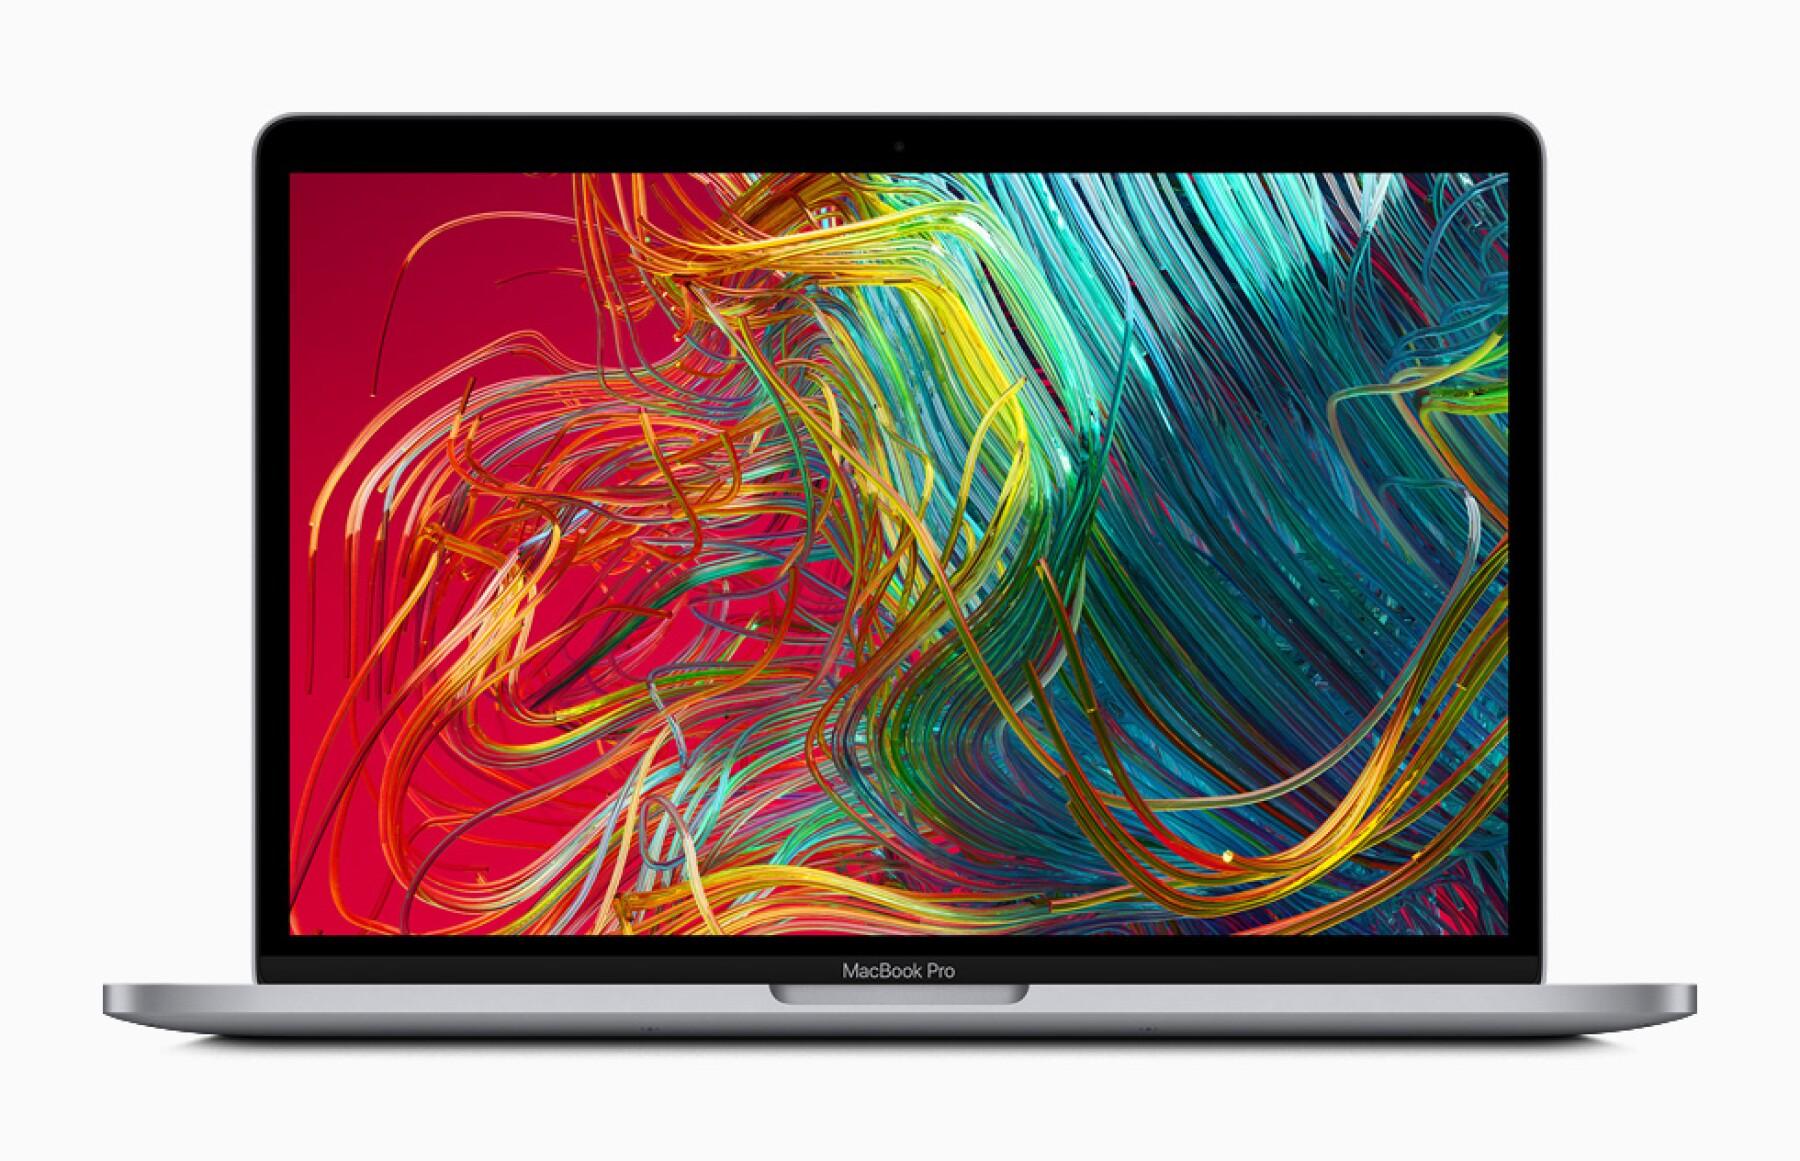 Apple_macbook_pro-13-inch-with-retina-display_screen_05042020_big.jpg.large.jpg